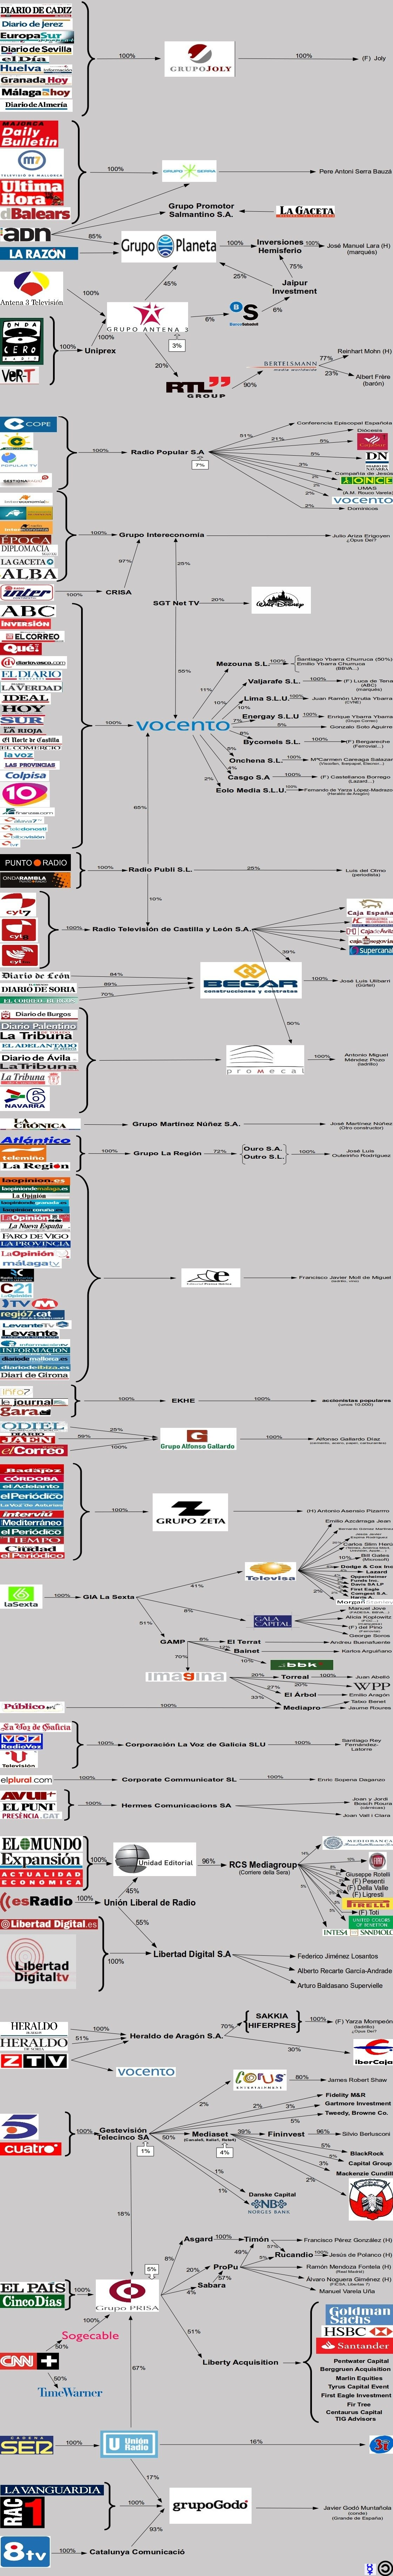 medios-de-comunicacion-propietarios.jpg